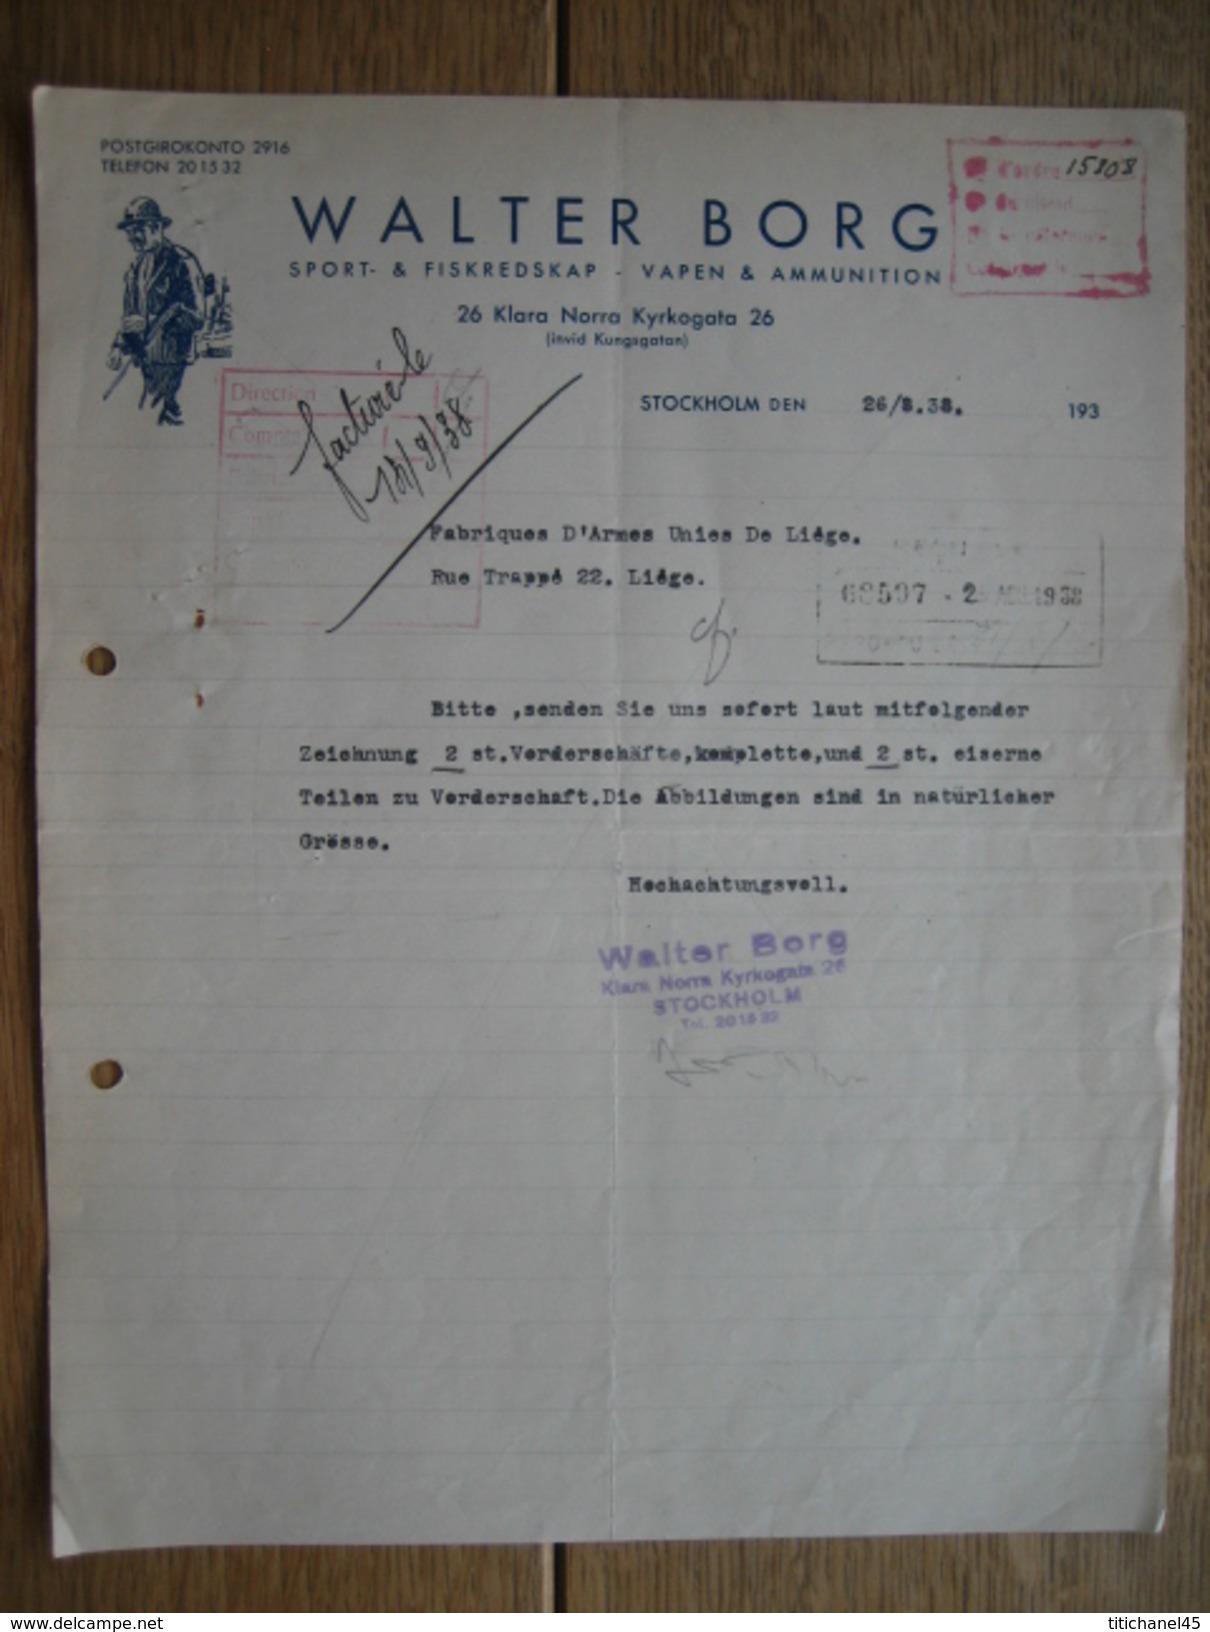 STOCKHOLM 1938 - WALTER BORG - Vapen & Ammunition, Sport & Fiskredskap - Factures & Documents Commerciaux